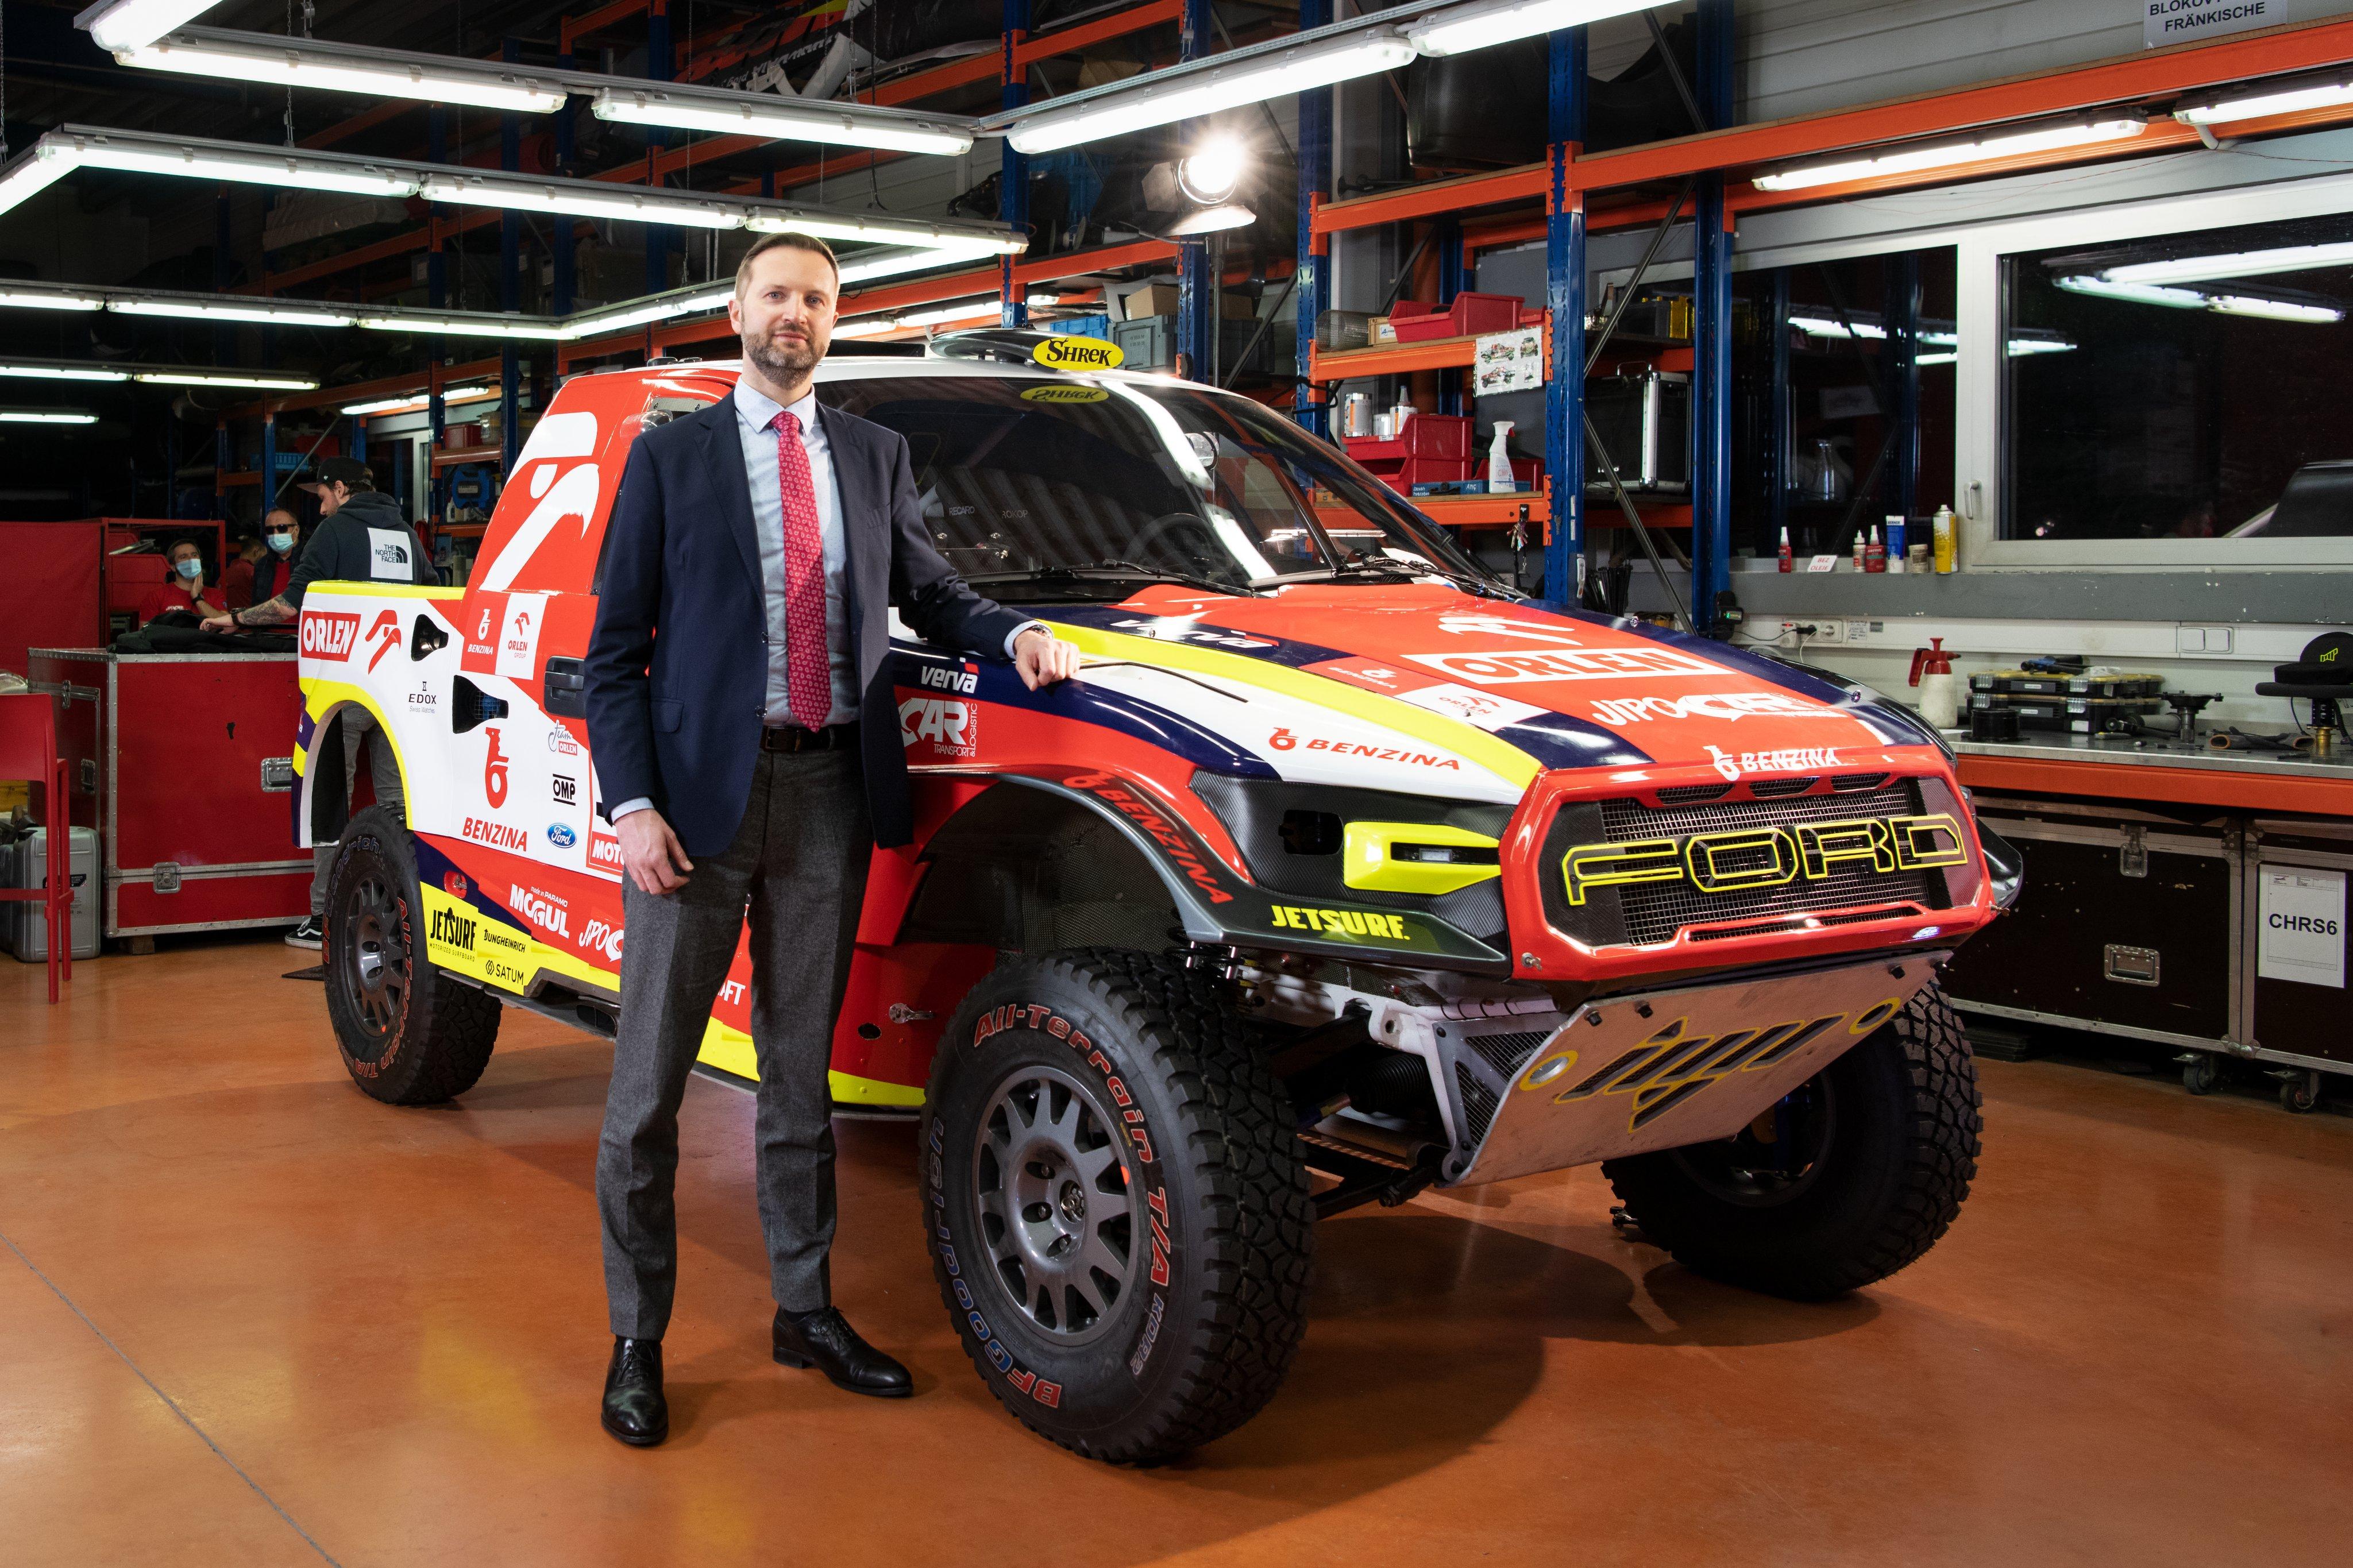 2021 43º Rallye Raid Dakar - Arabia Saudí [3-15 Enero] Envg0fLXUAIAhsw?format=jpg&name=4096x4096